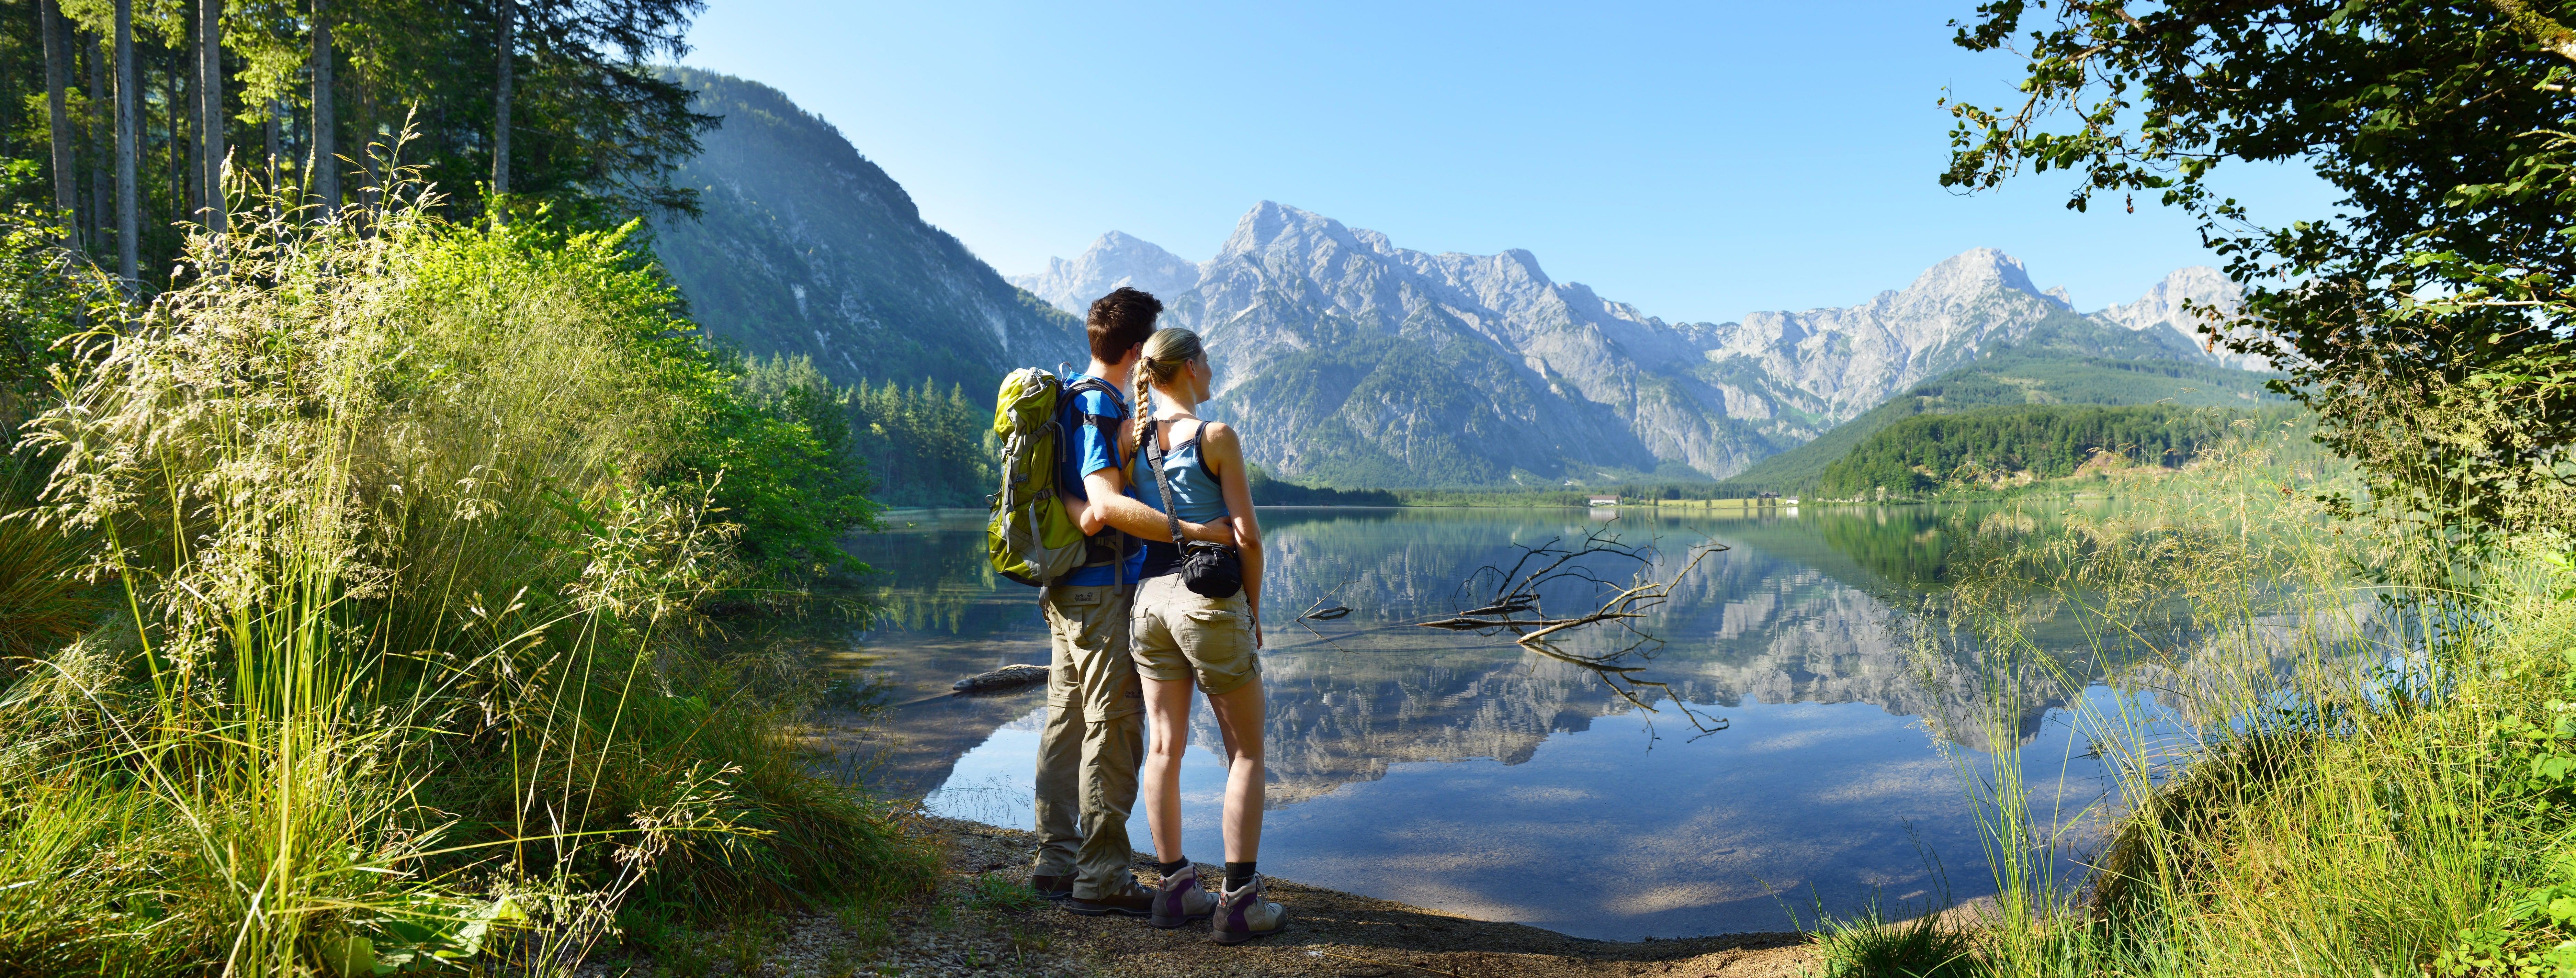 JUFA_Almtal_(c)_OOE_Tourismus_Wanderer_am_Almsee